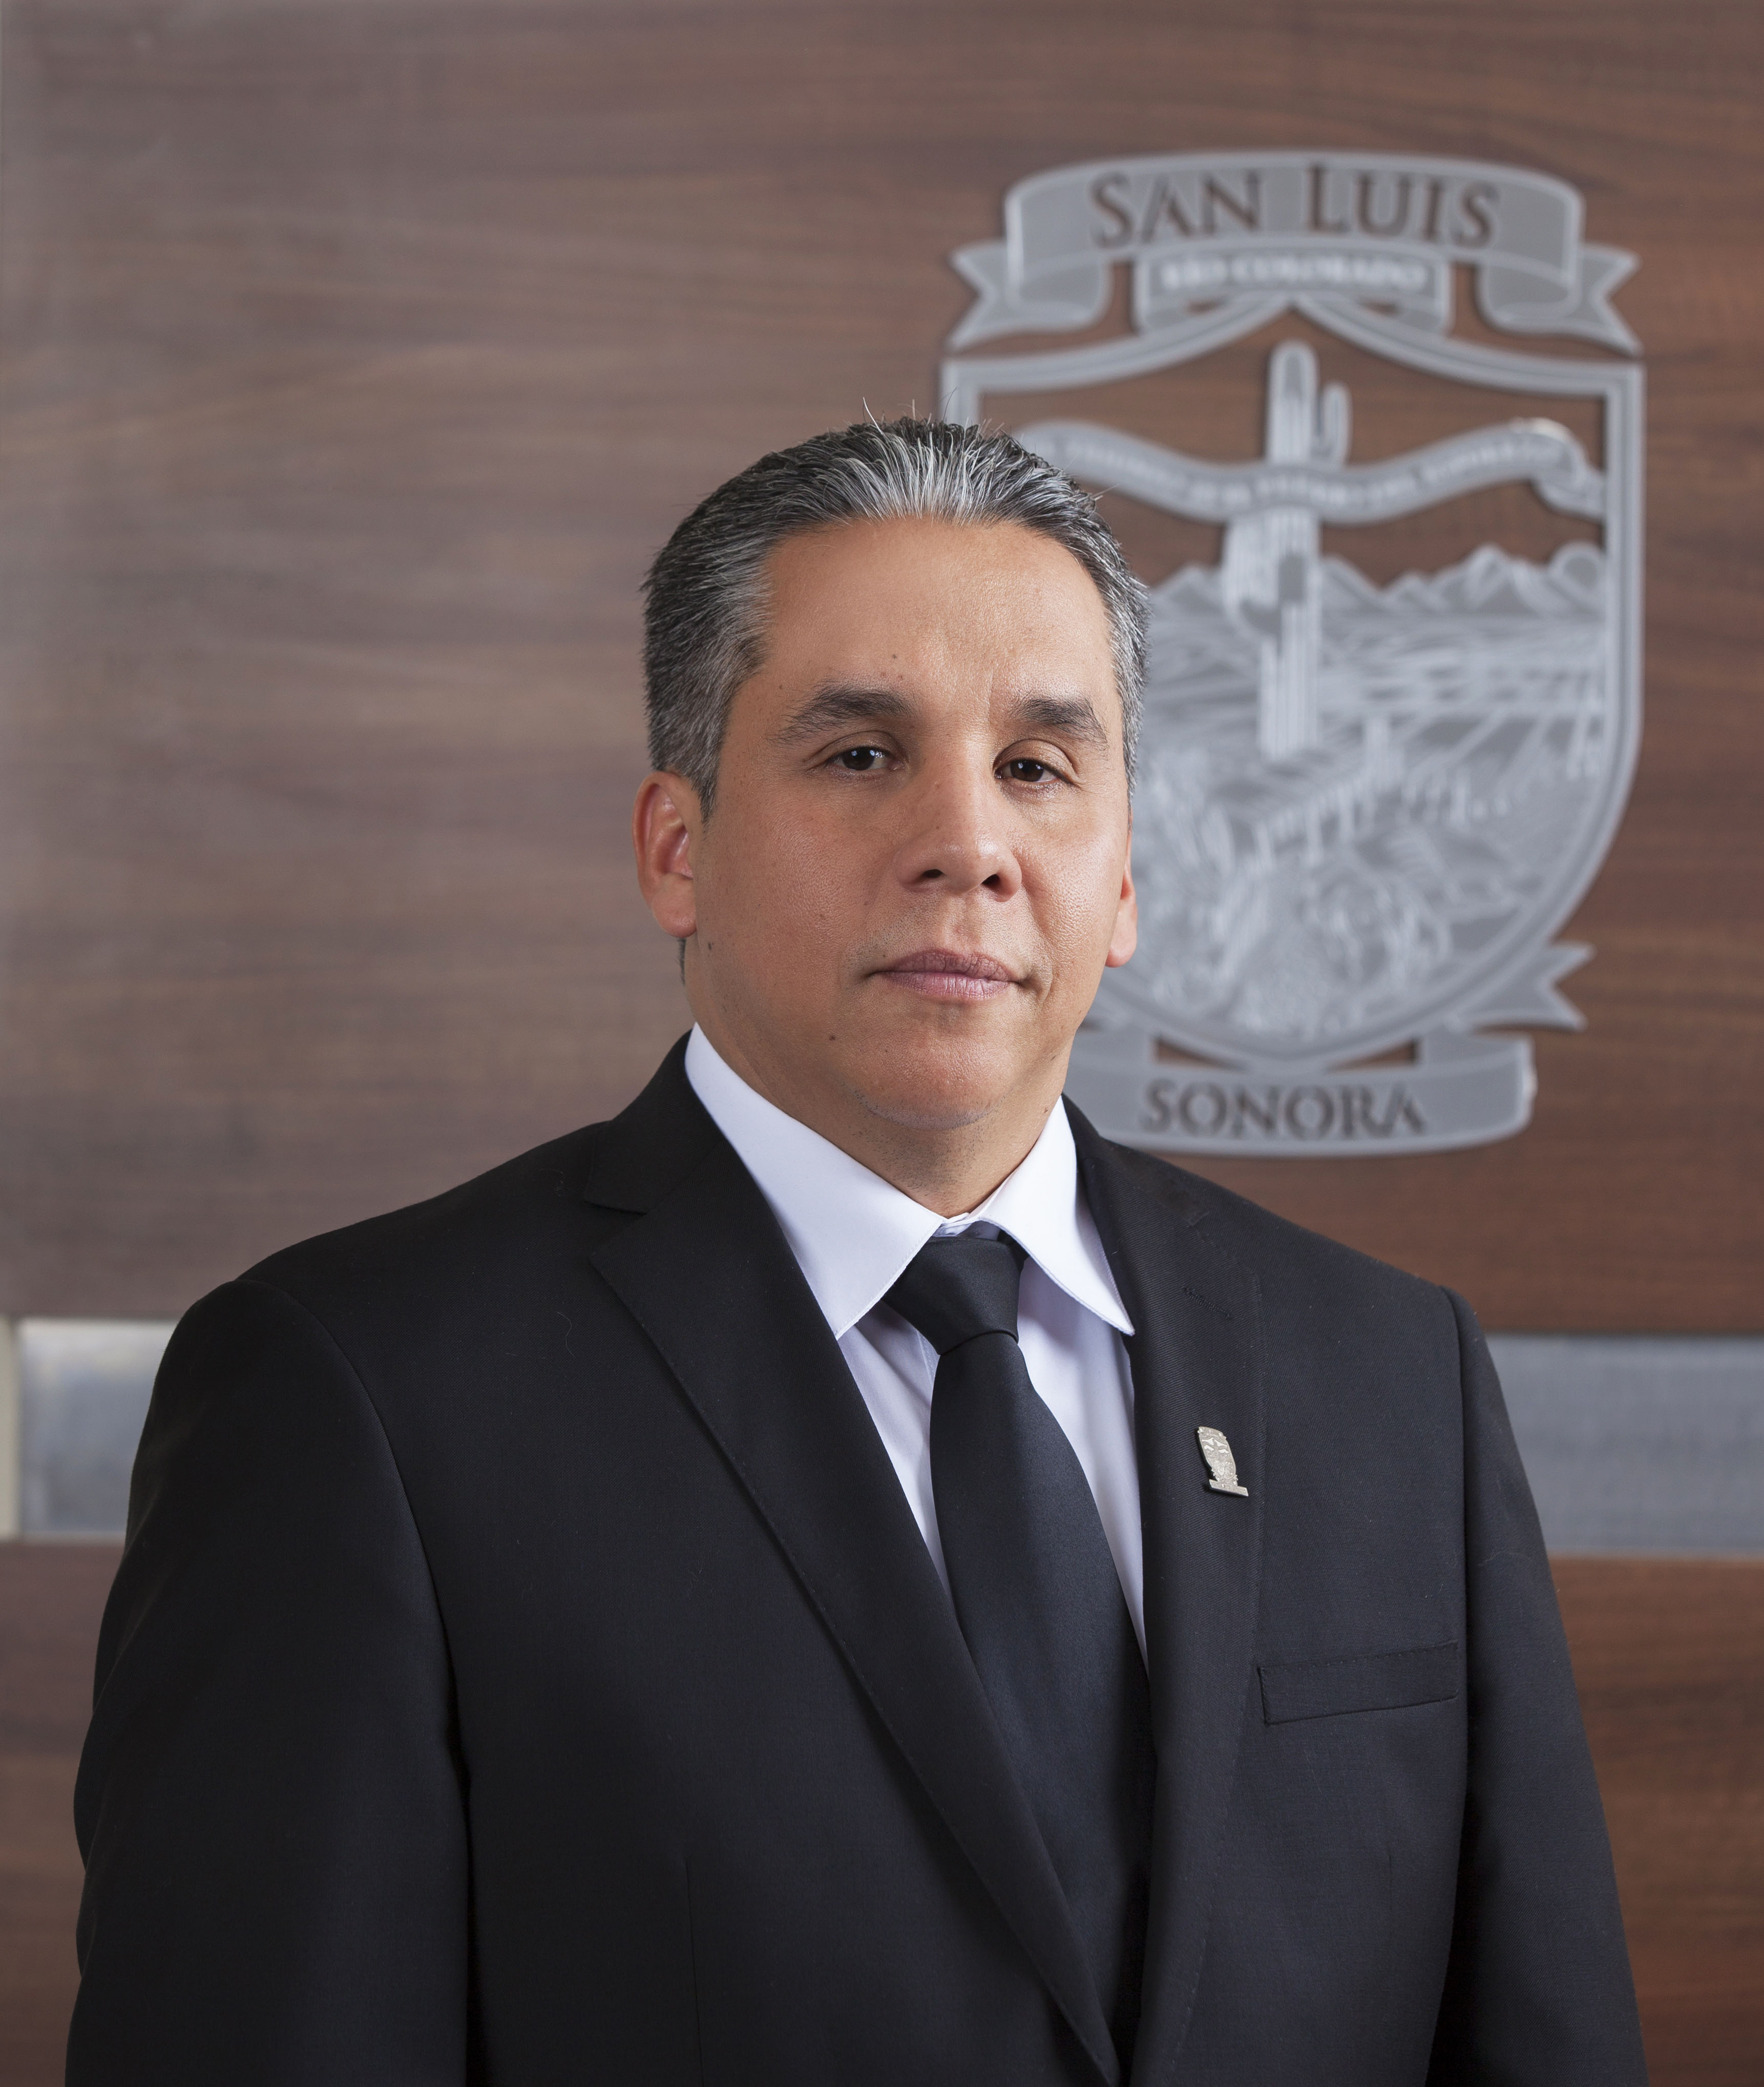 HECTOR MANUEL CID MANRIQUEZ